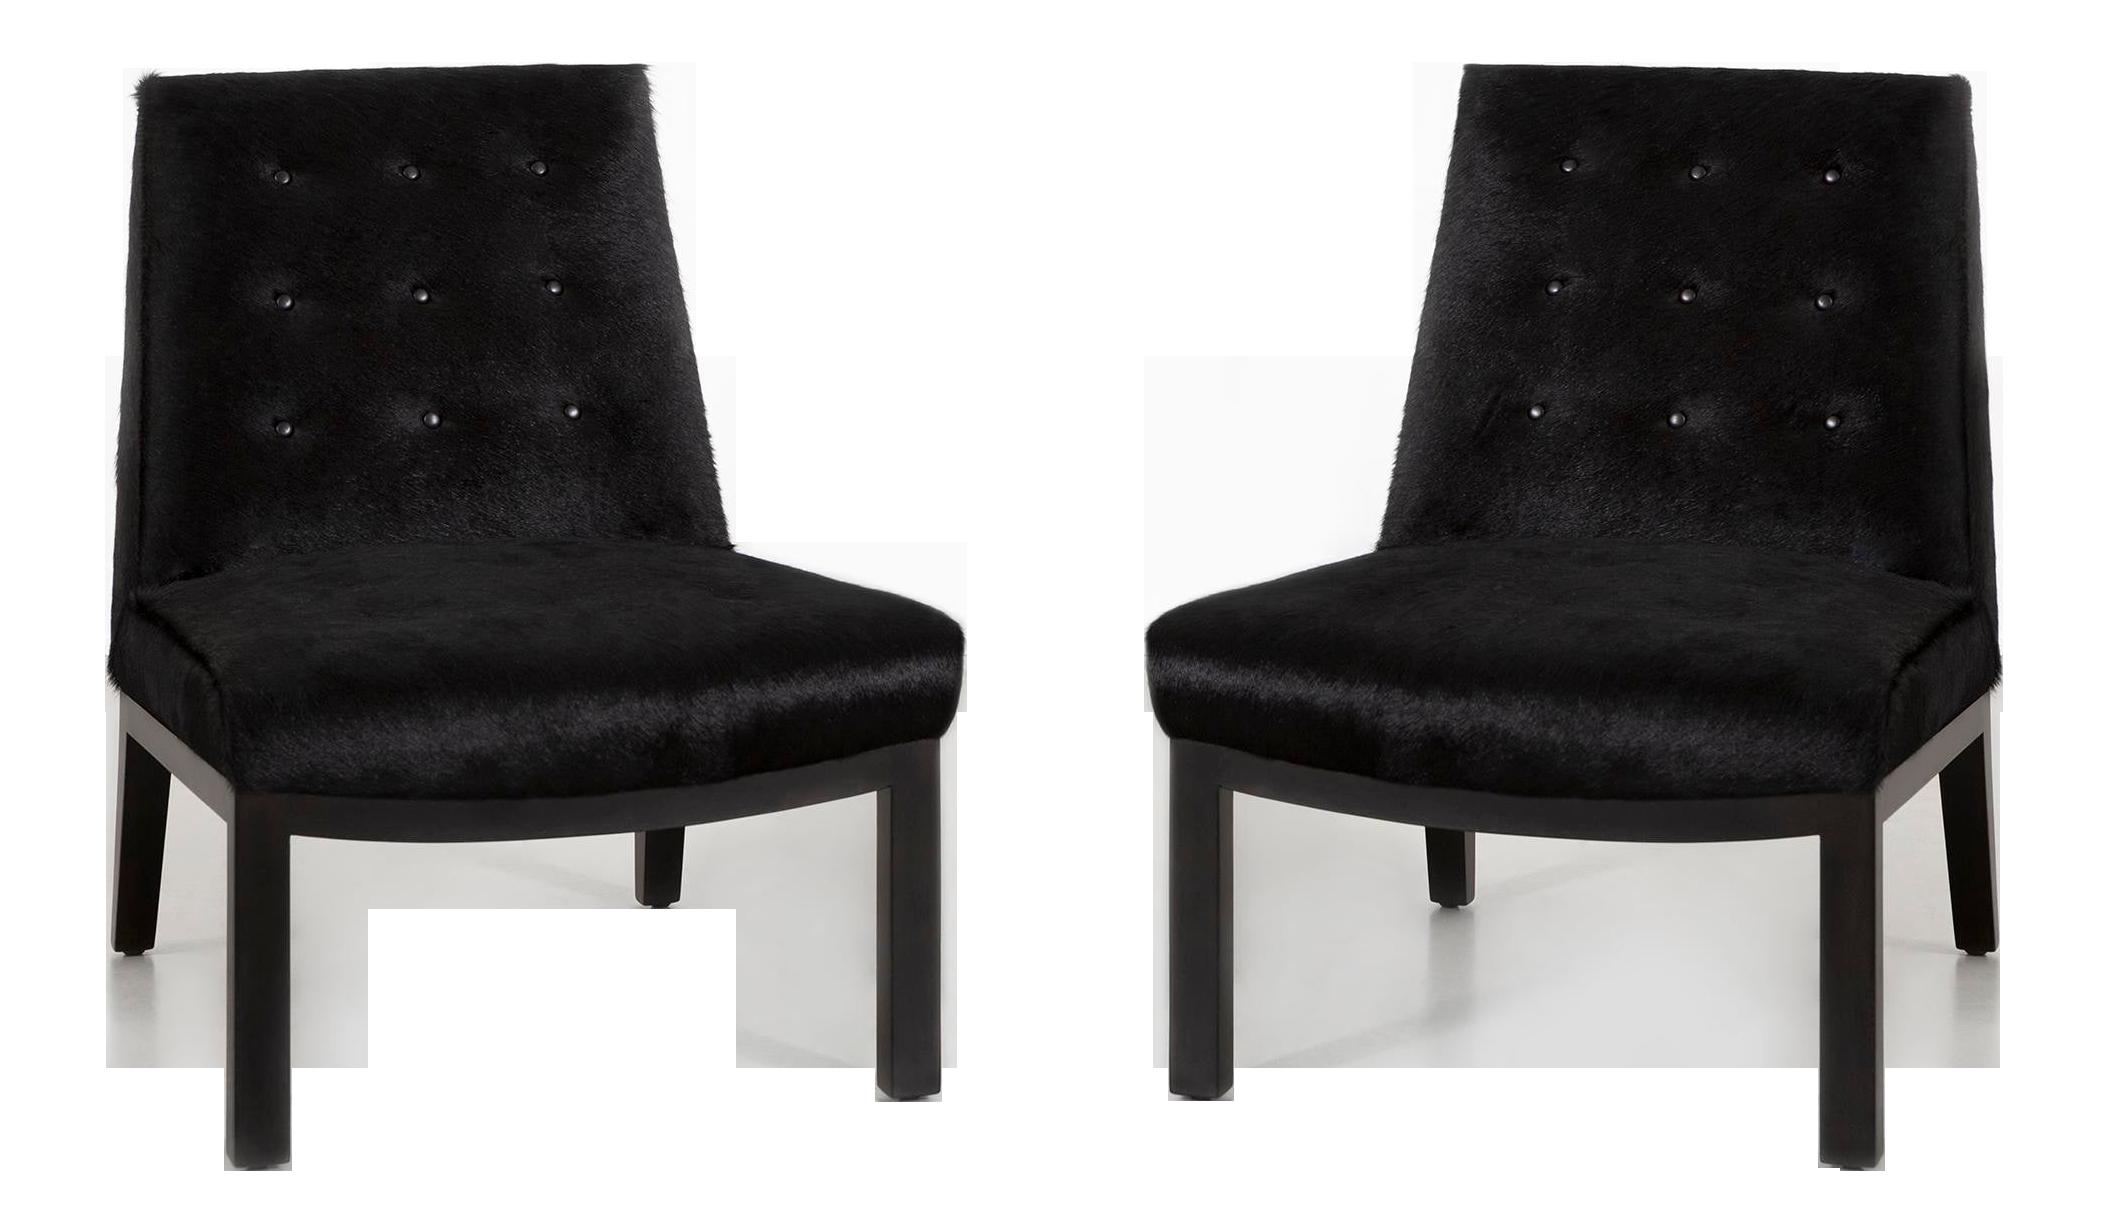 Set Of Edward Wormley For Dunbar Slipper Chairs In Brazilian Cowhide